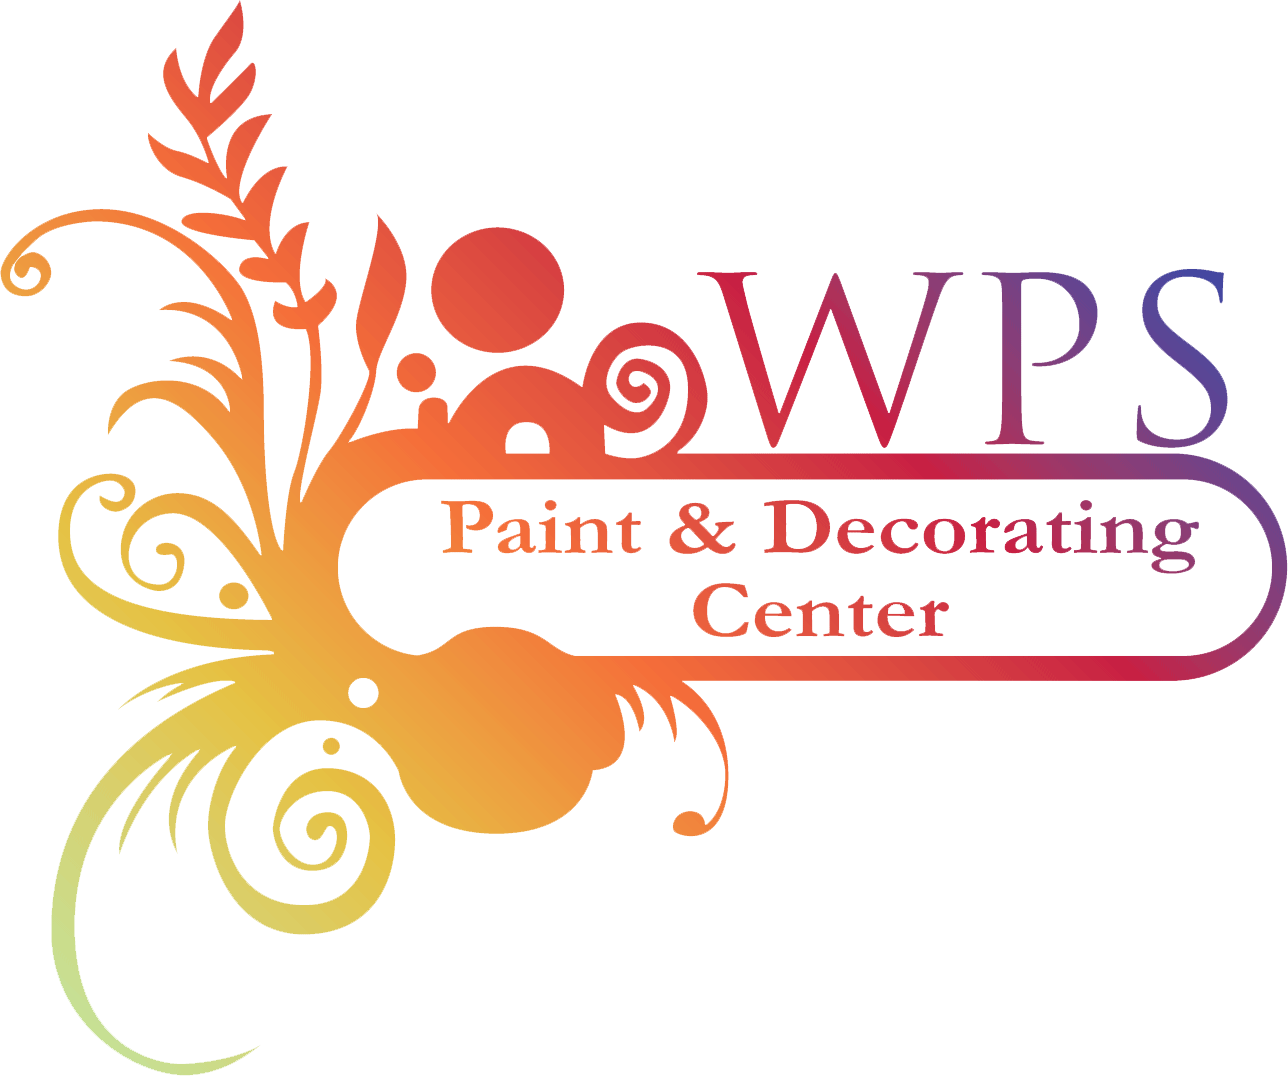 WPS Paint & Decorating Center